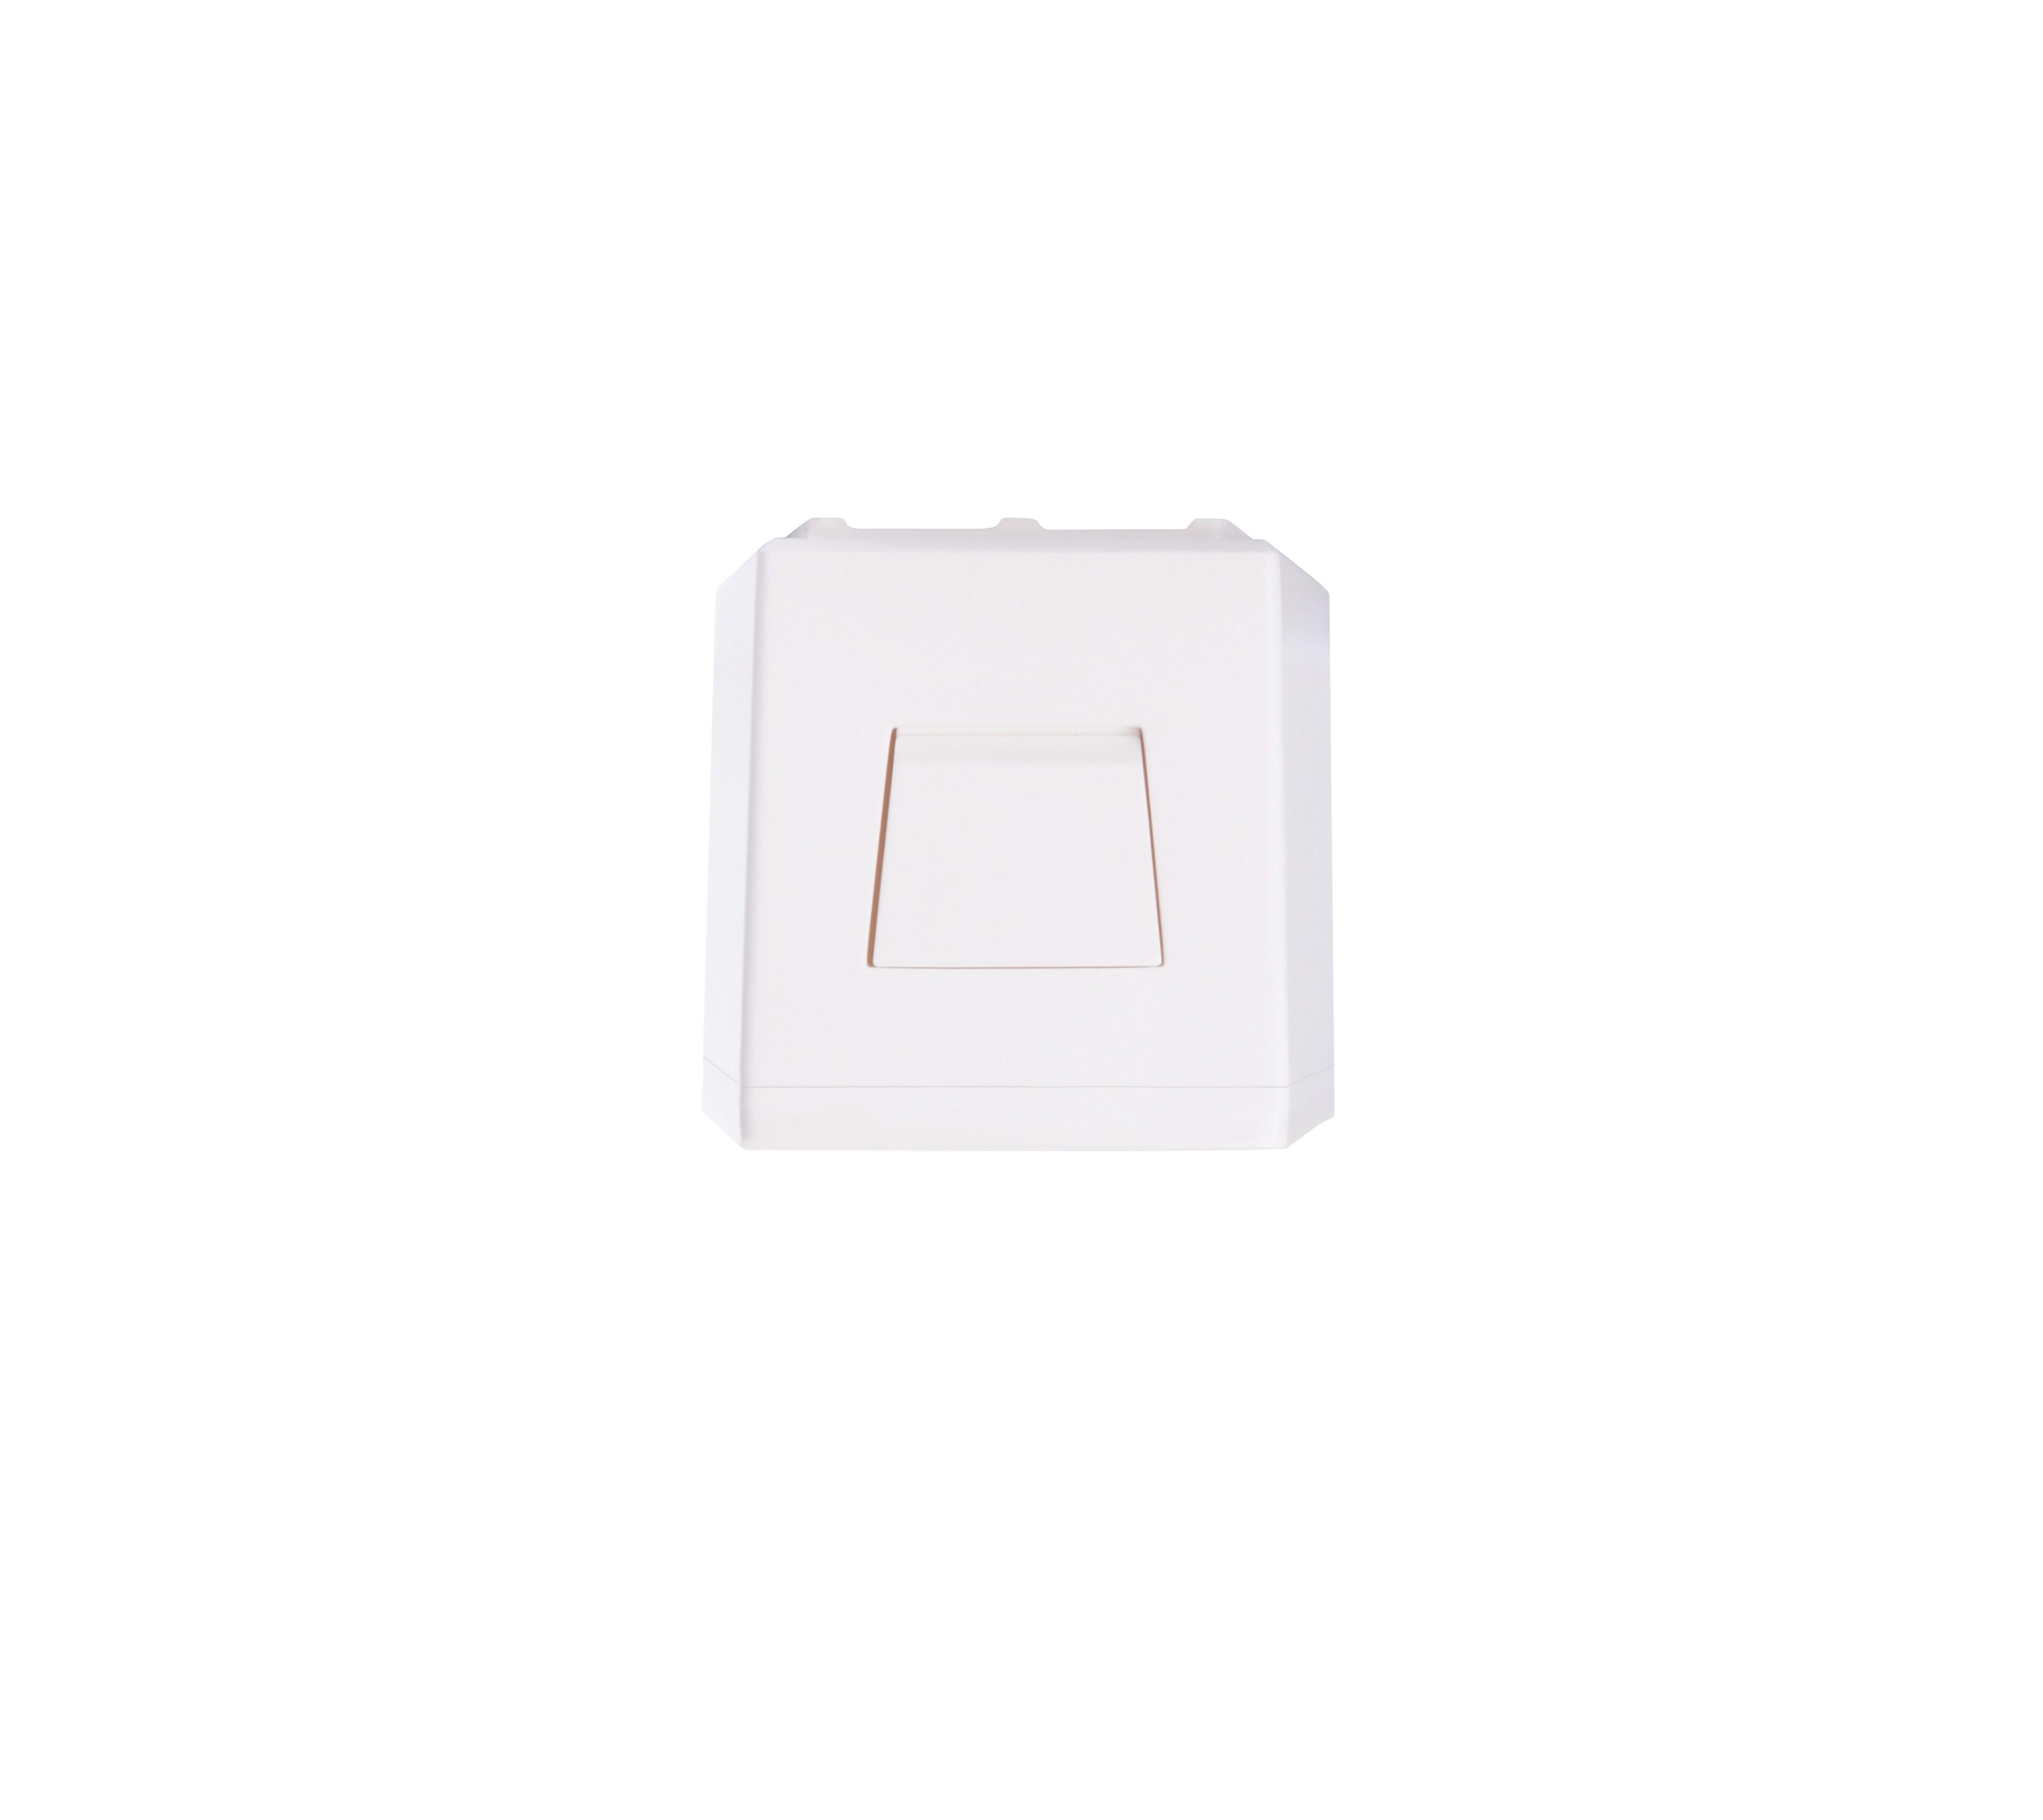 Lampa antipanica led Intelight 94714   3h mentinut test automat 1